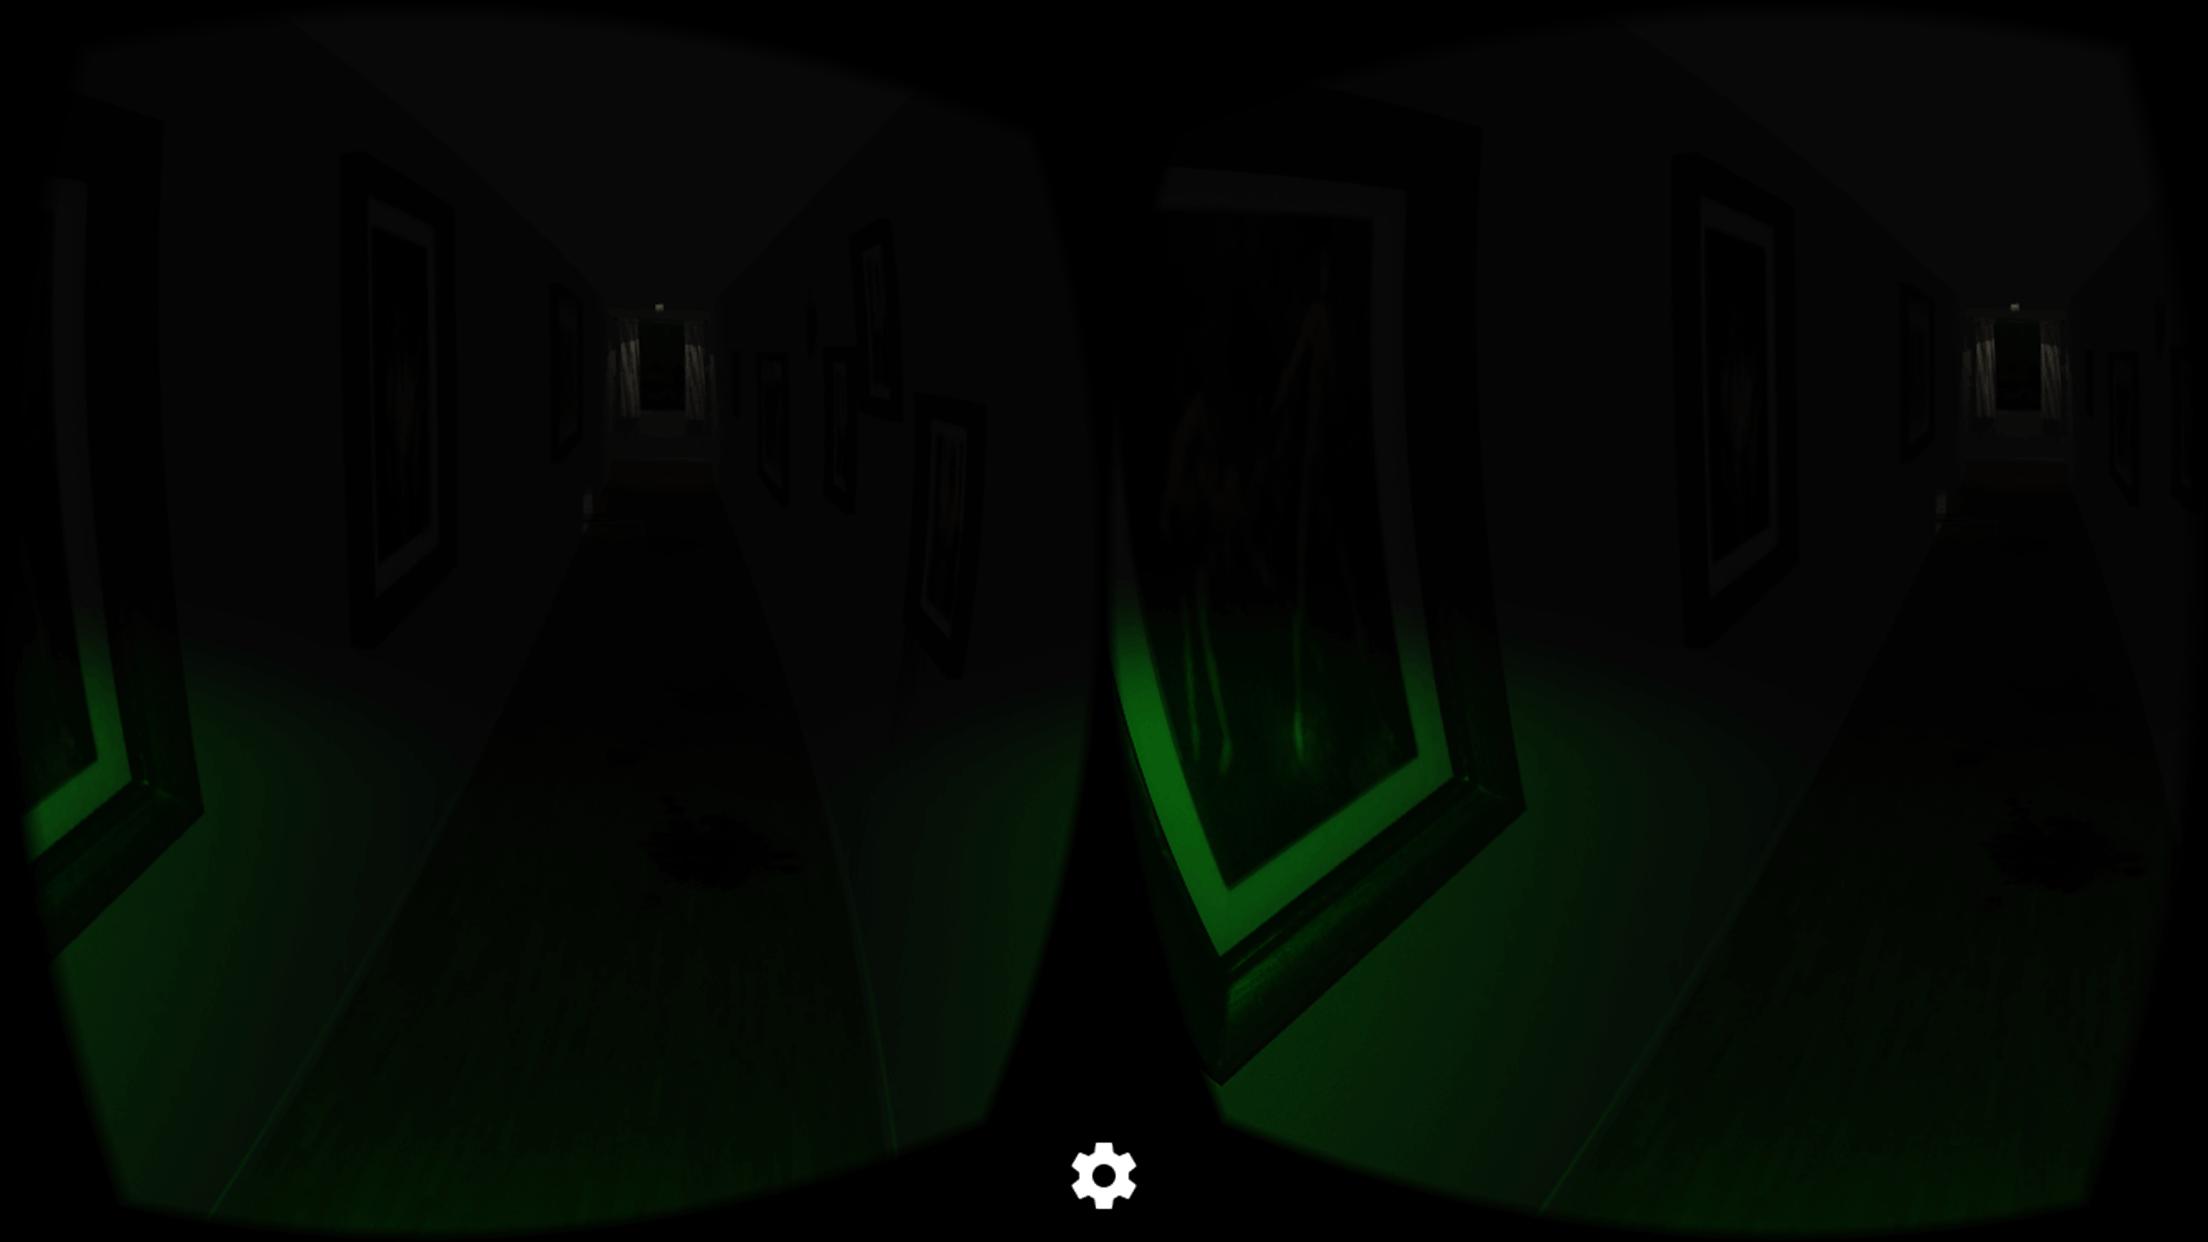 bloodcurdling VR